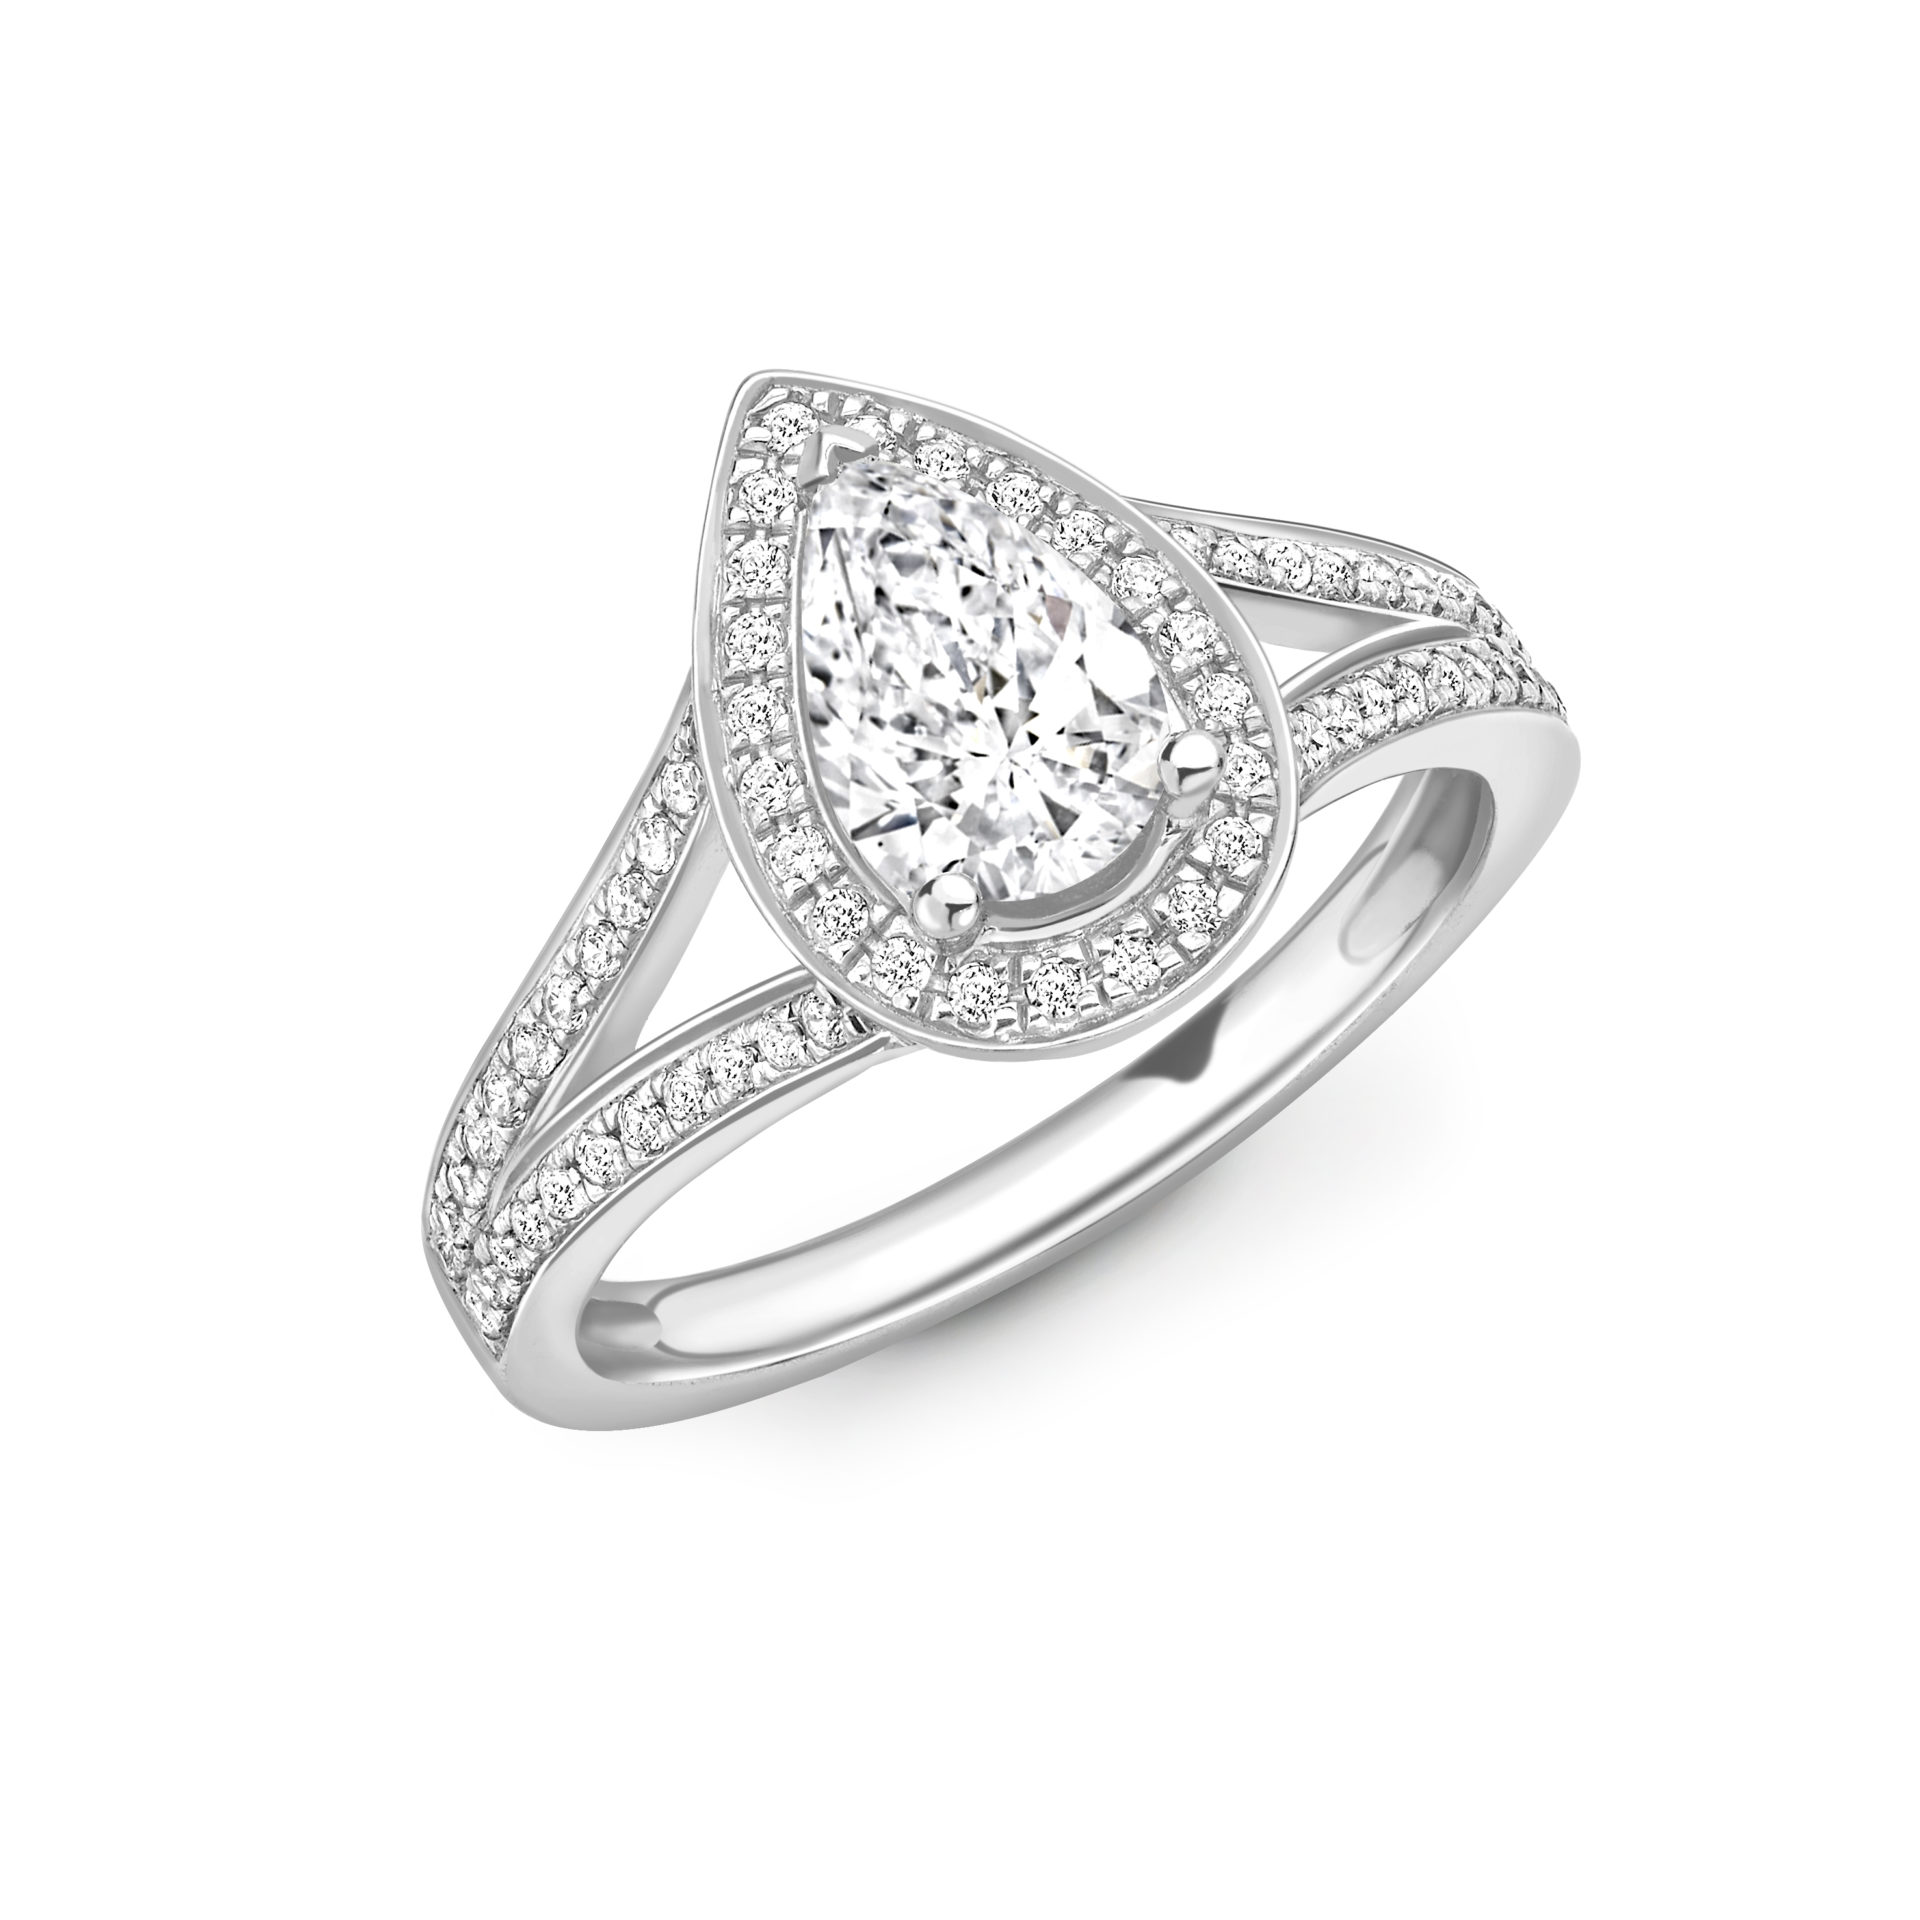 Halona-ring